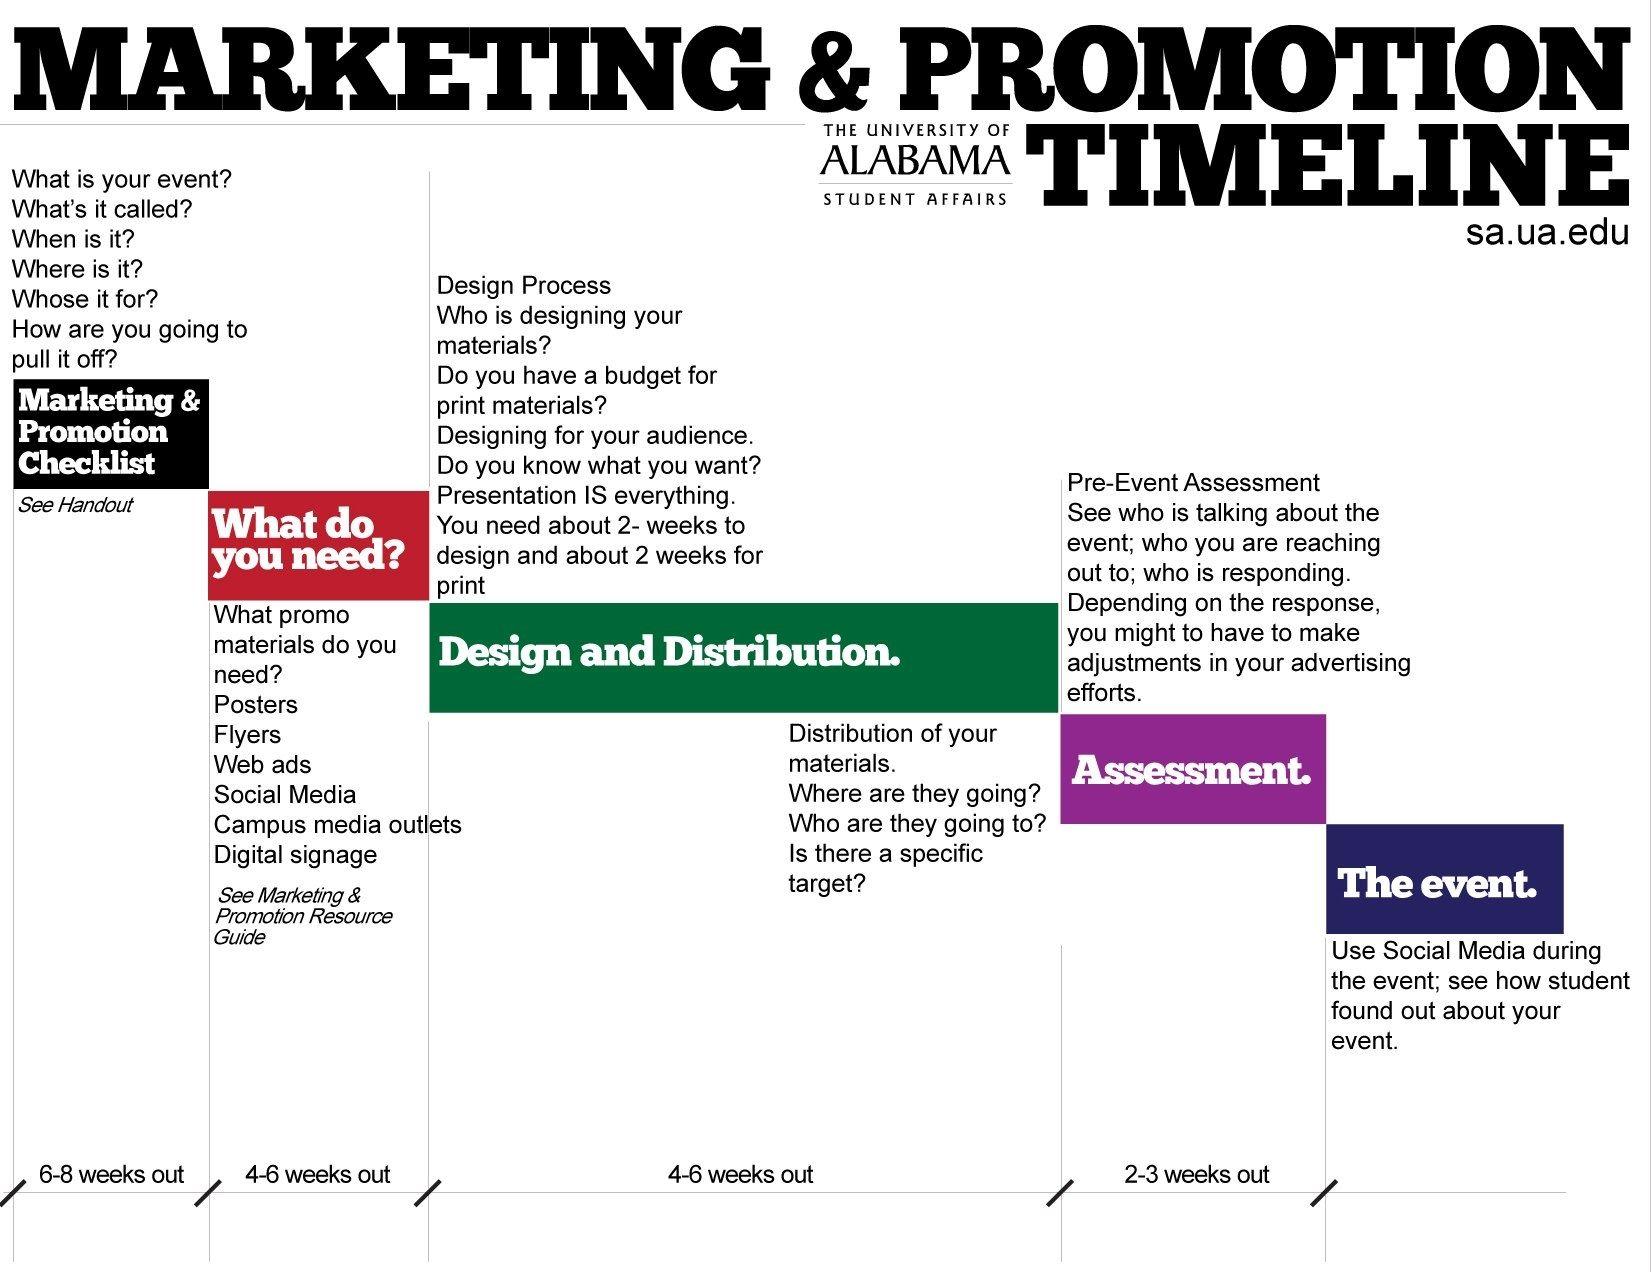 Marketing Timeline | INFO 283 Personal Board | Event ...